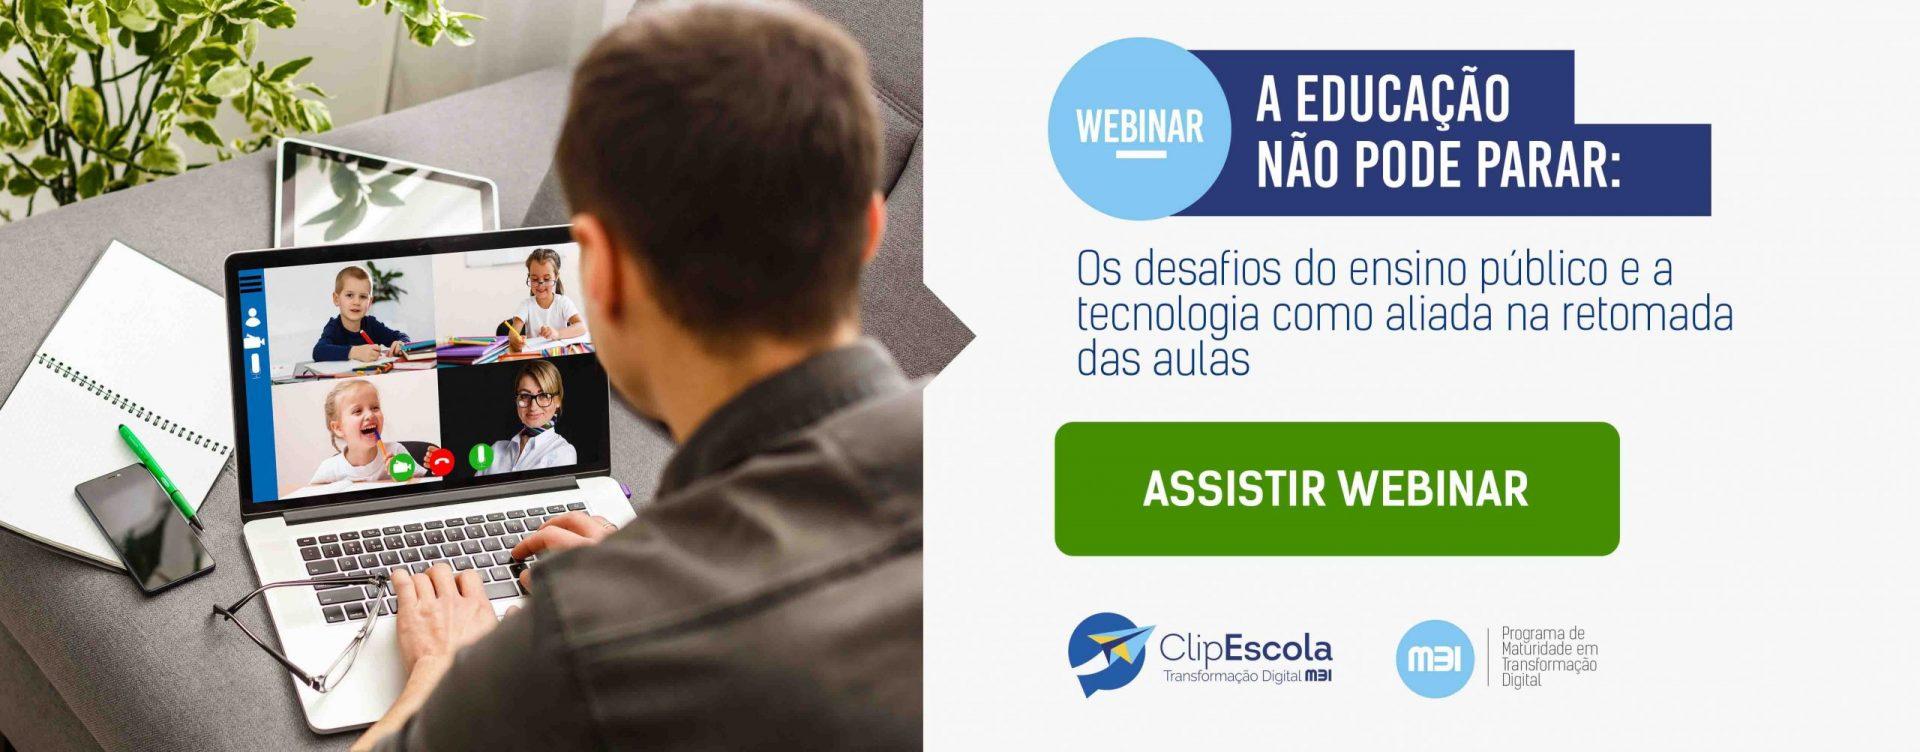 CTA_Webinar_Tecnologia Ensino Público